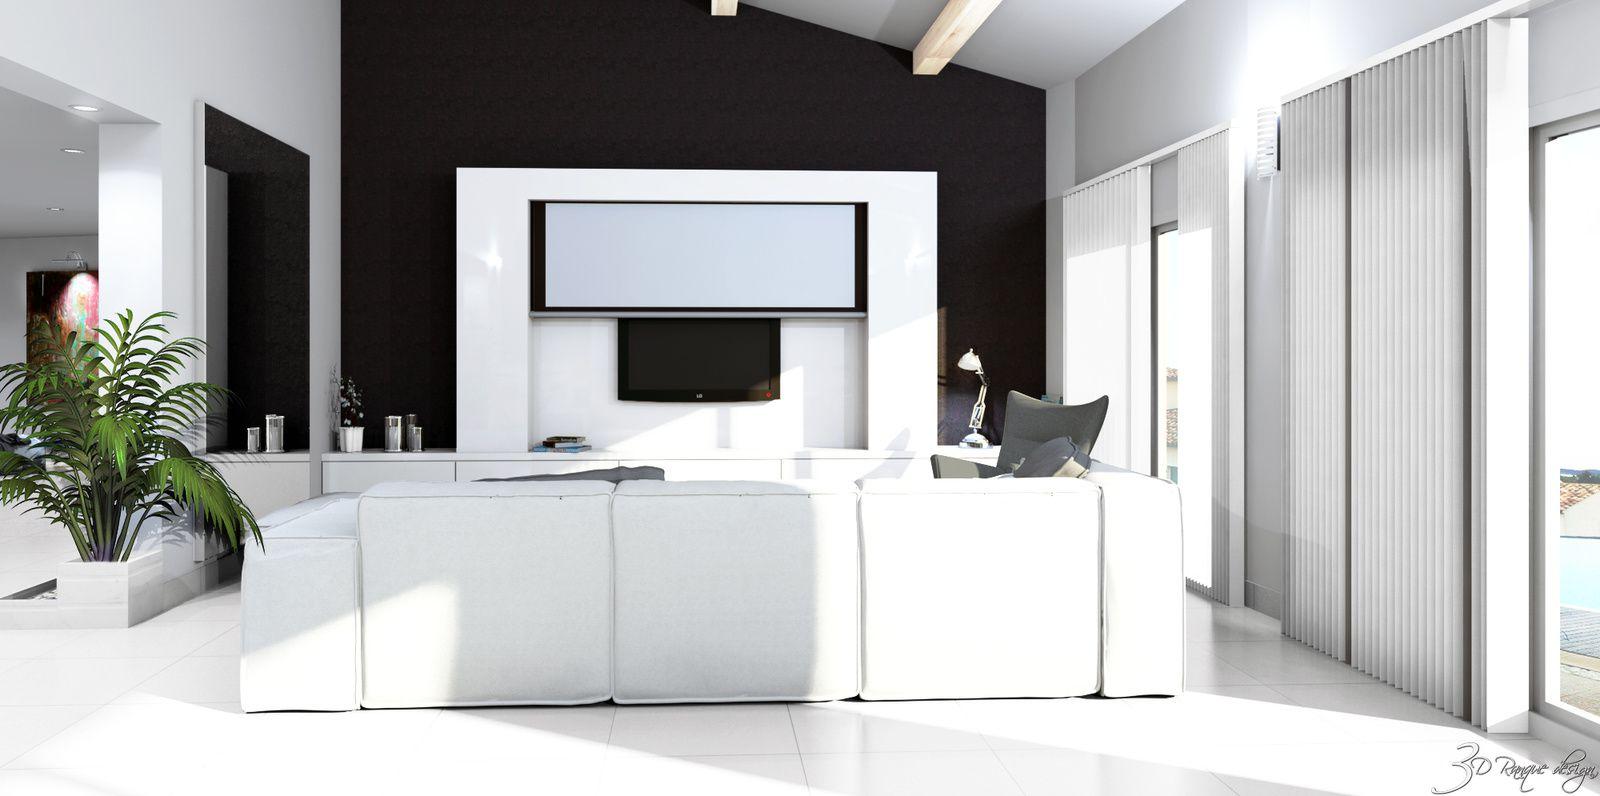 projet am nagement int rieur entr e 2 salons coin cuisine. Black Bedroom Furniture Sets. Home Design Ideas